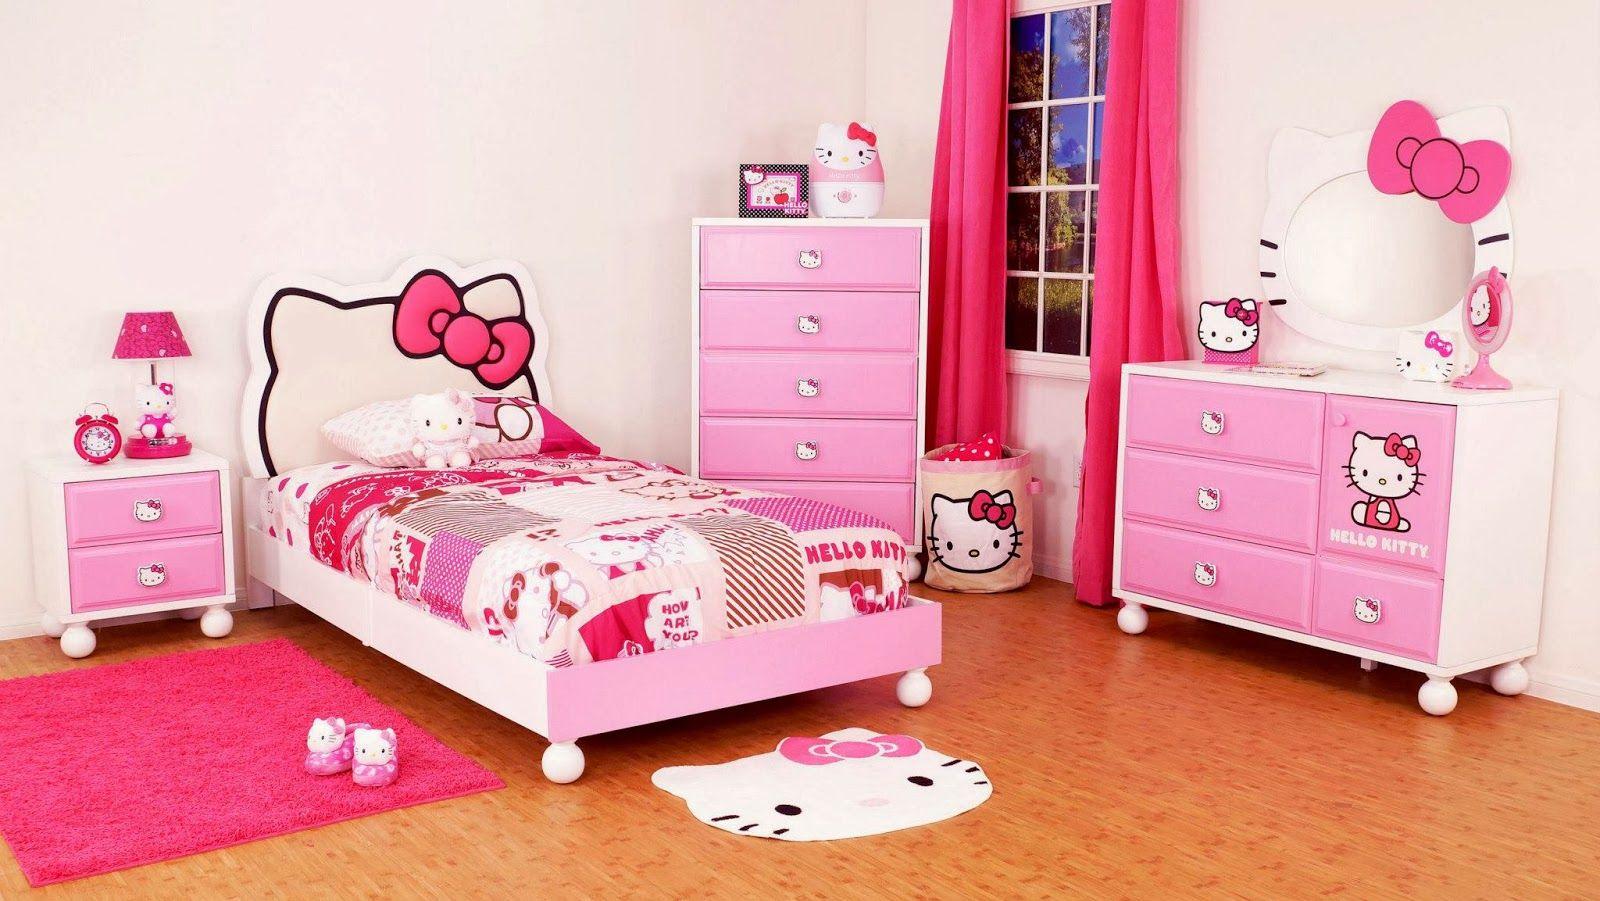 Exceptionnel Lovely Room Chambre Hello Kitty, Petite Fille, Petite Maison, Décoration  Maison, Design